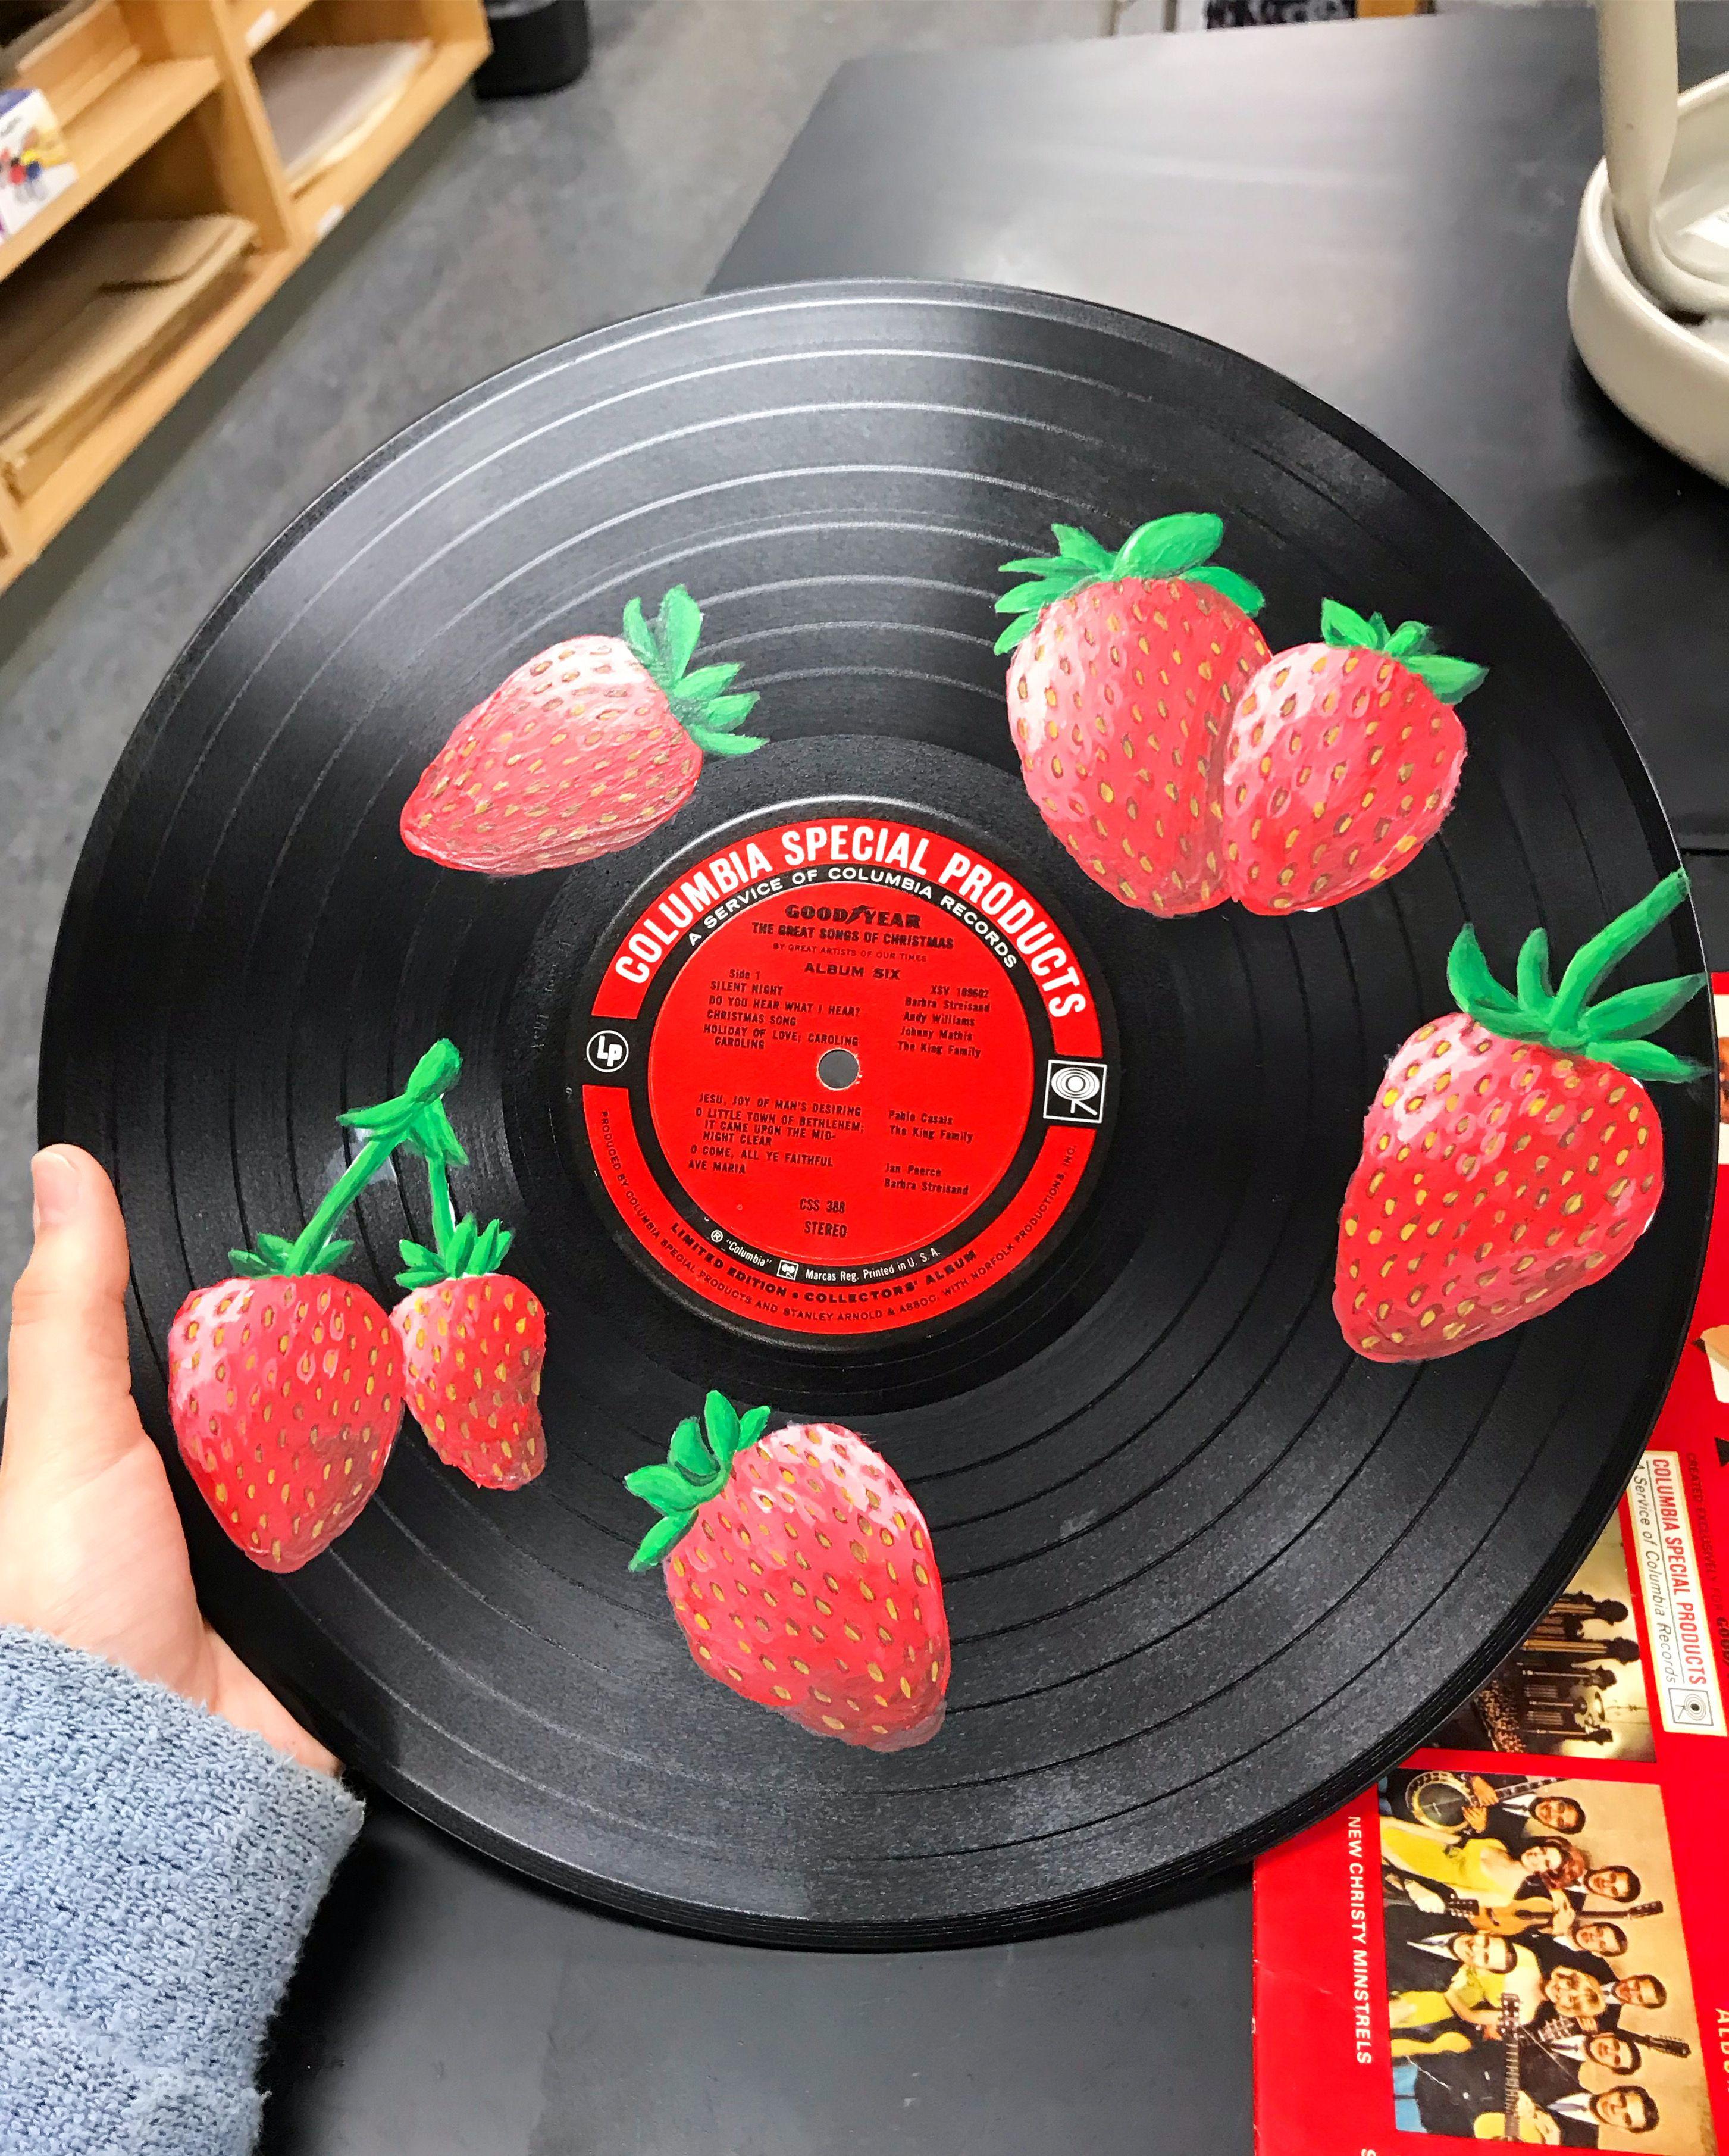 Strawberry Painting On Vinyl Record Vinyl Painted Vinyl Record Art Ideas Vinyl Art Paint